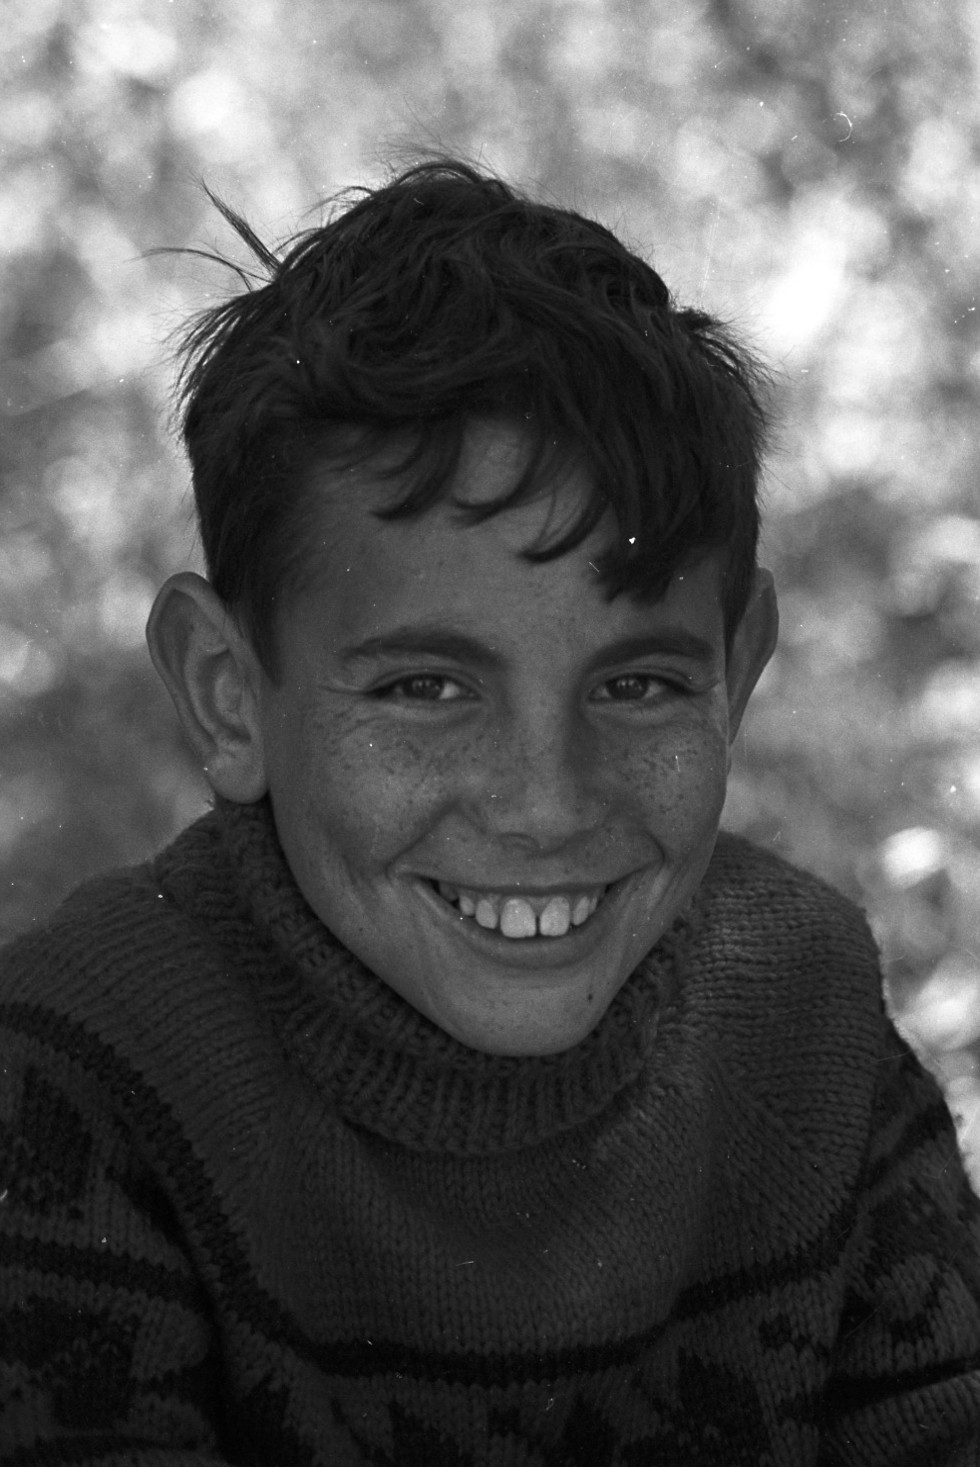 אמי רובינגר (צילום: דוד רובינגר)